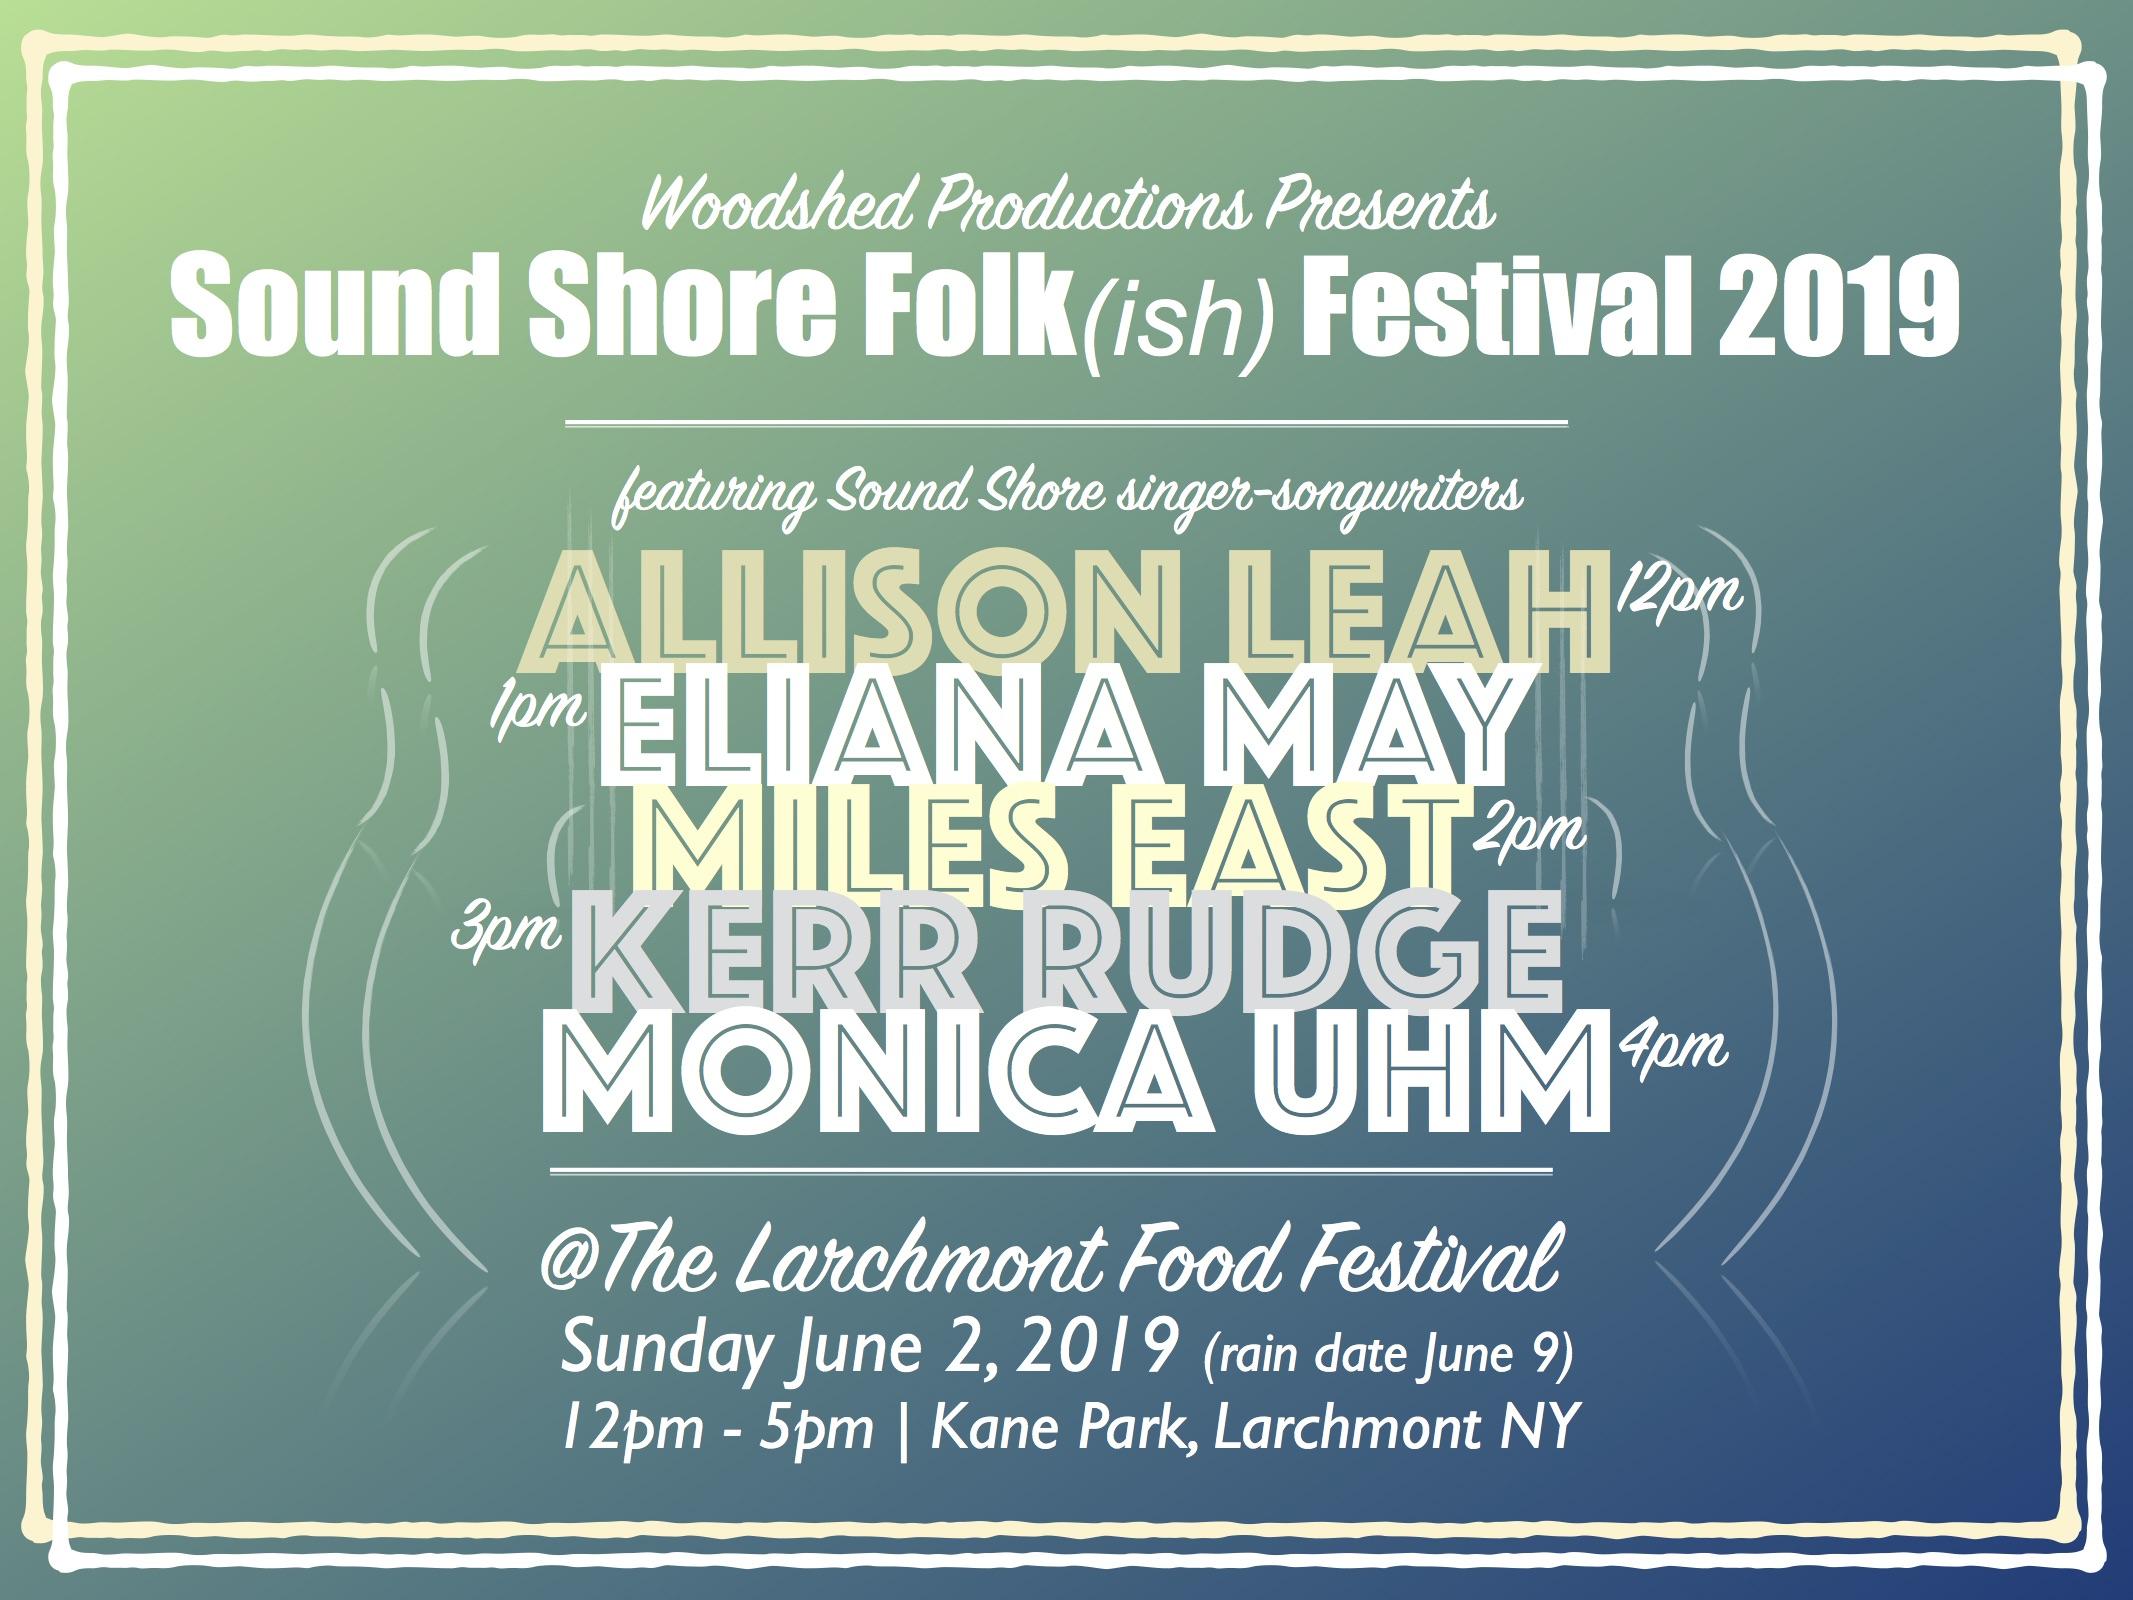 Sound Shore Folk(ish) Festival 2019